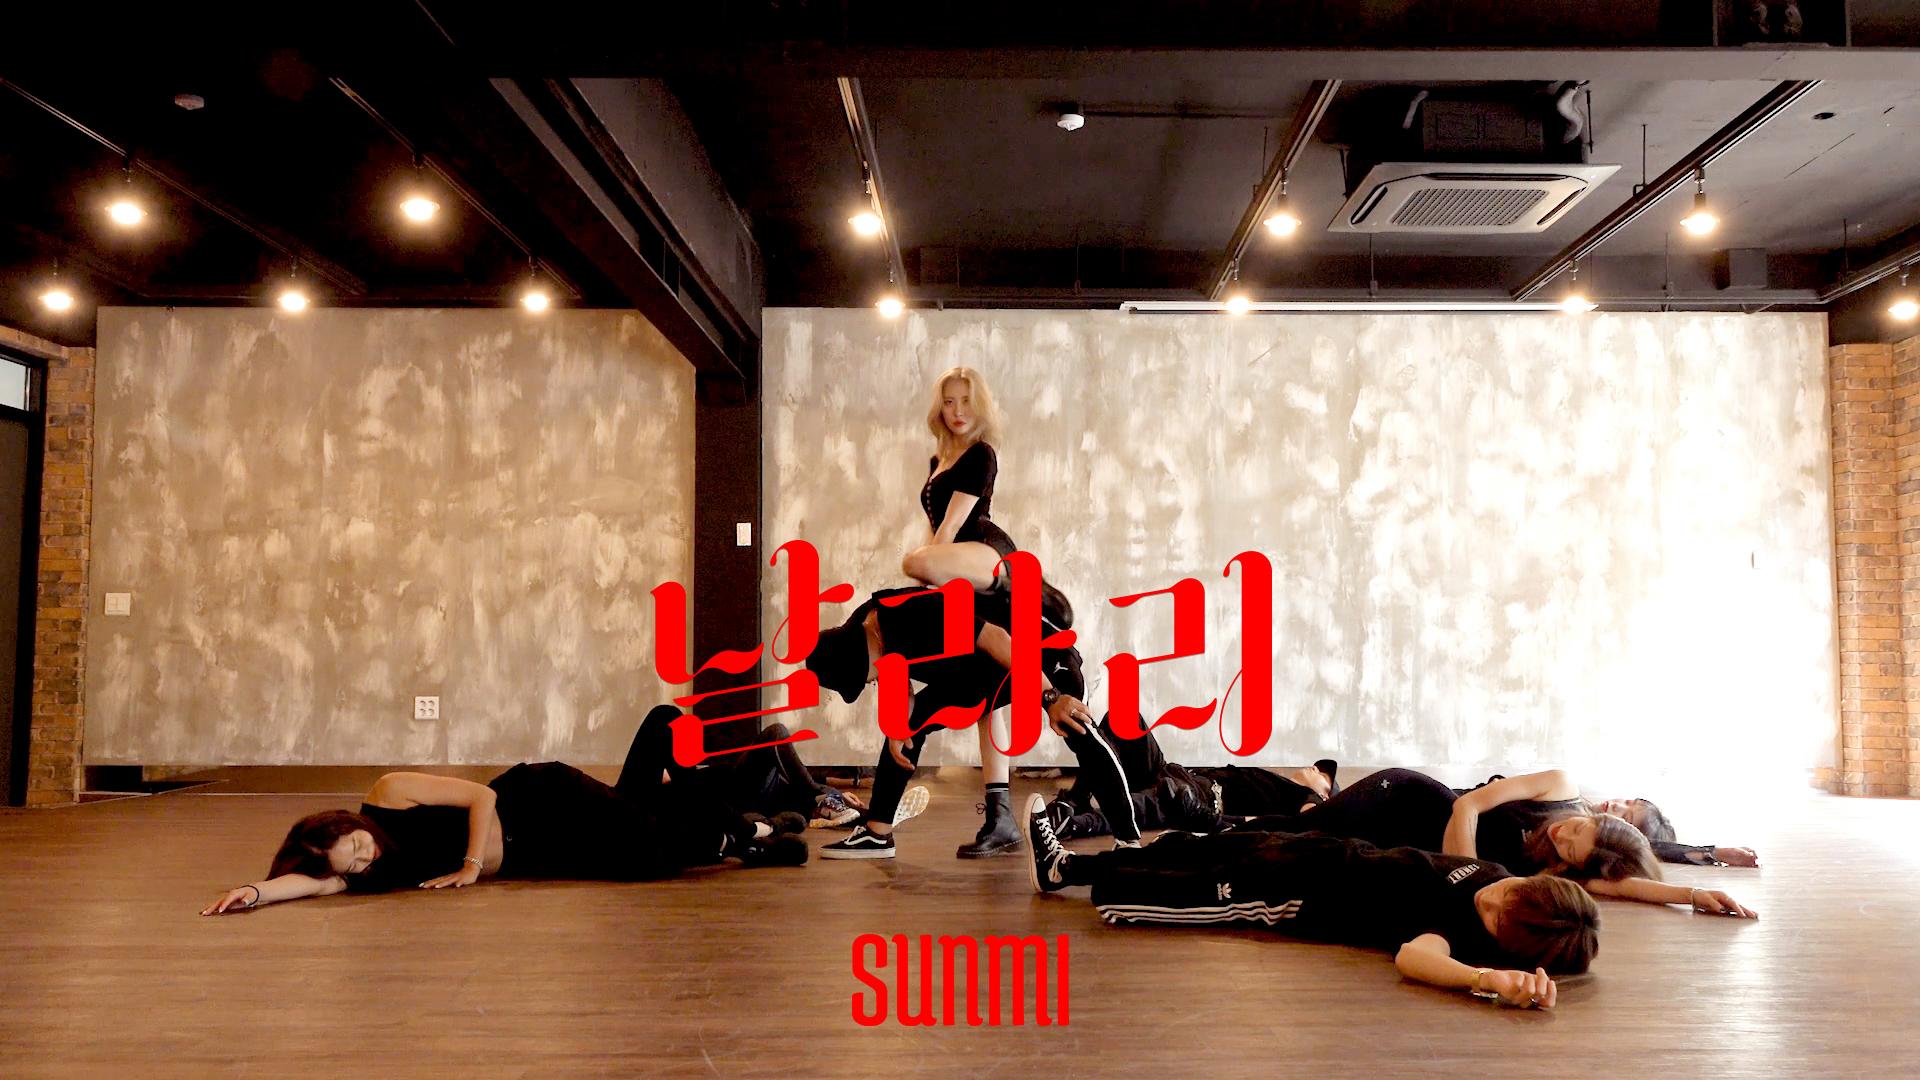 [Choreography Practice] 선미 (SUNMI) '날라리(LALALAY)' 안무 연습 영상